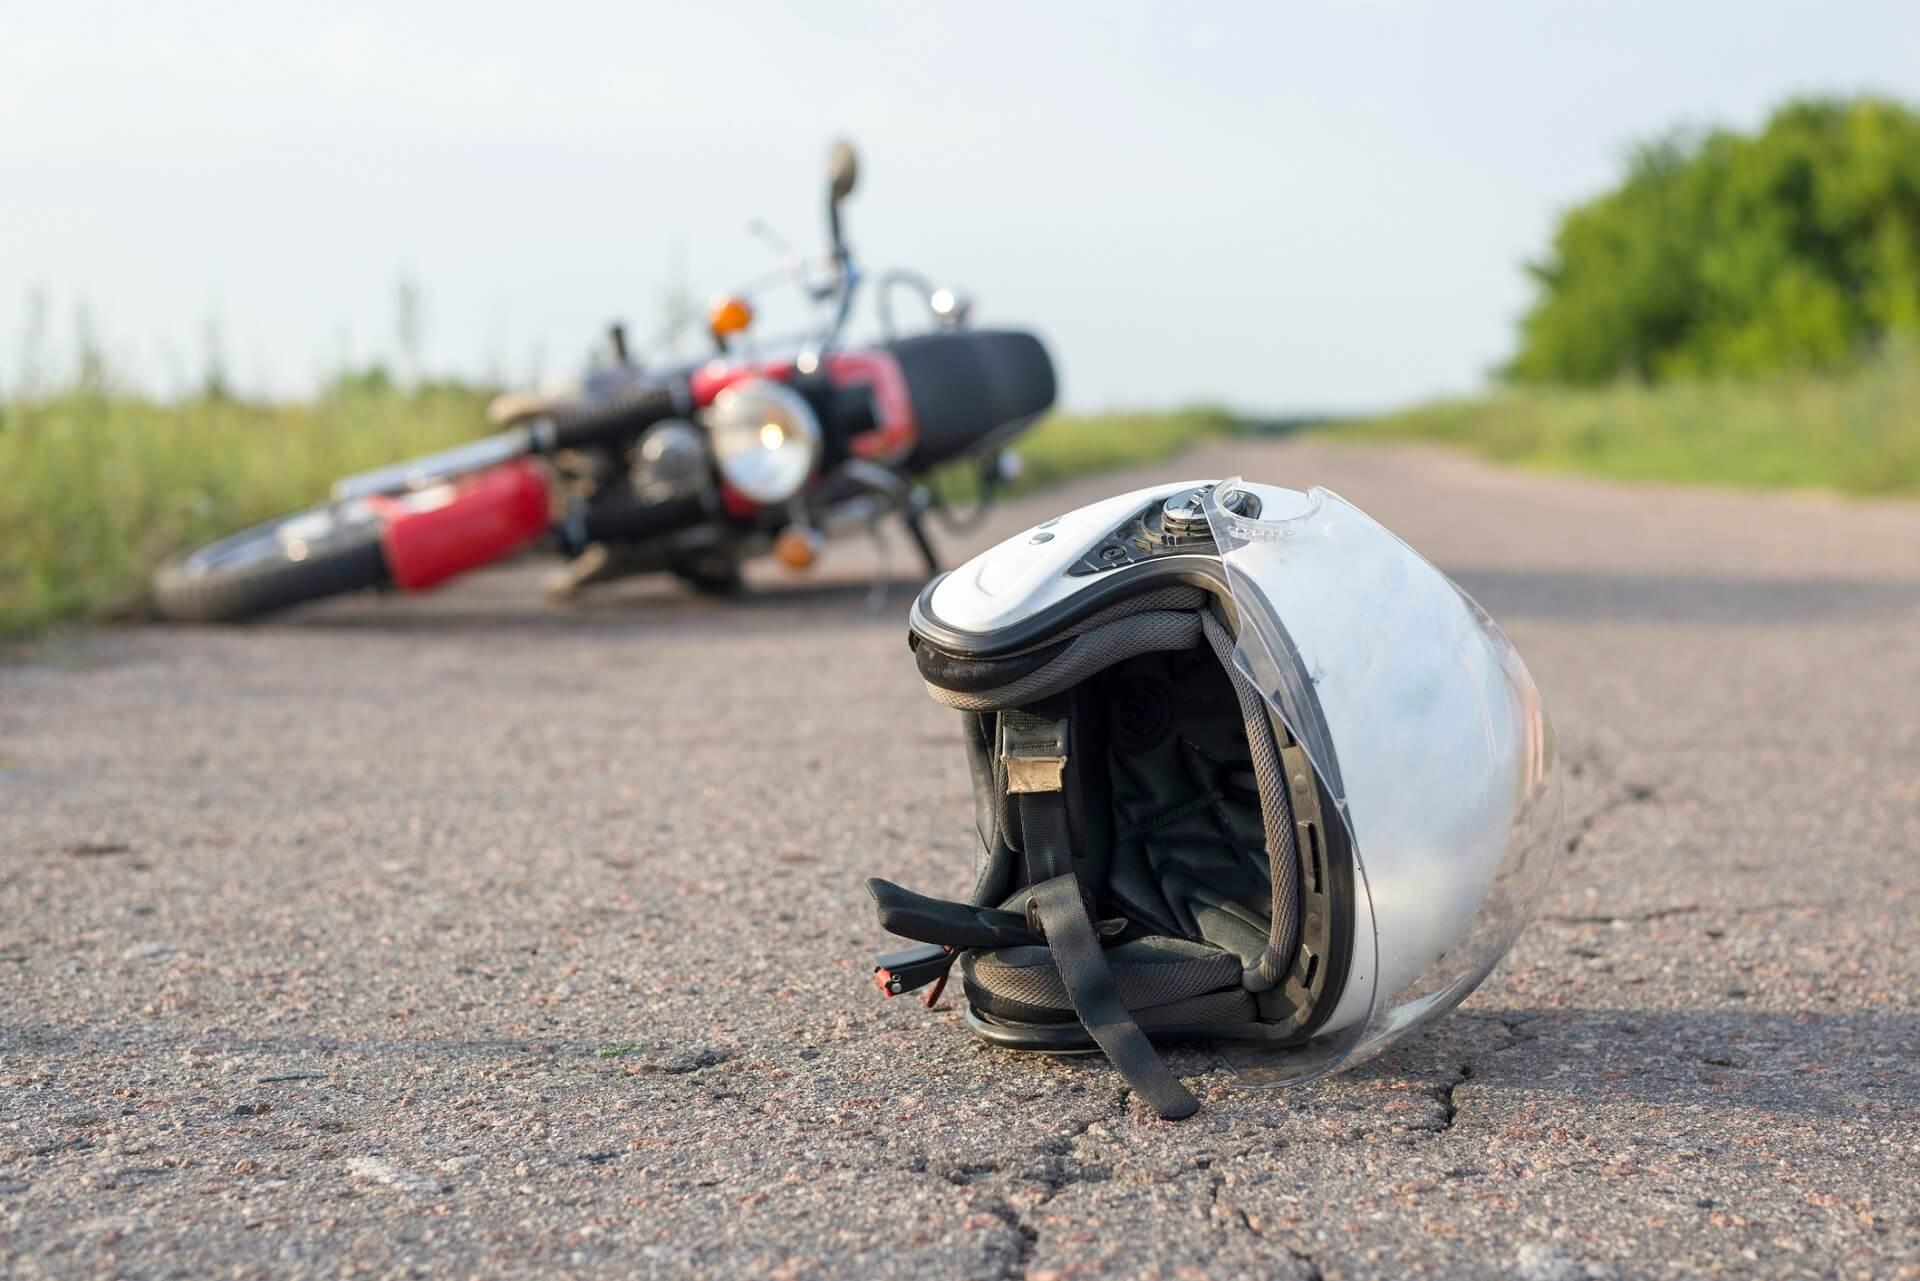 motorcycle accident lawyer calgary